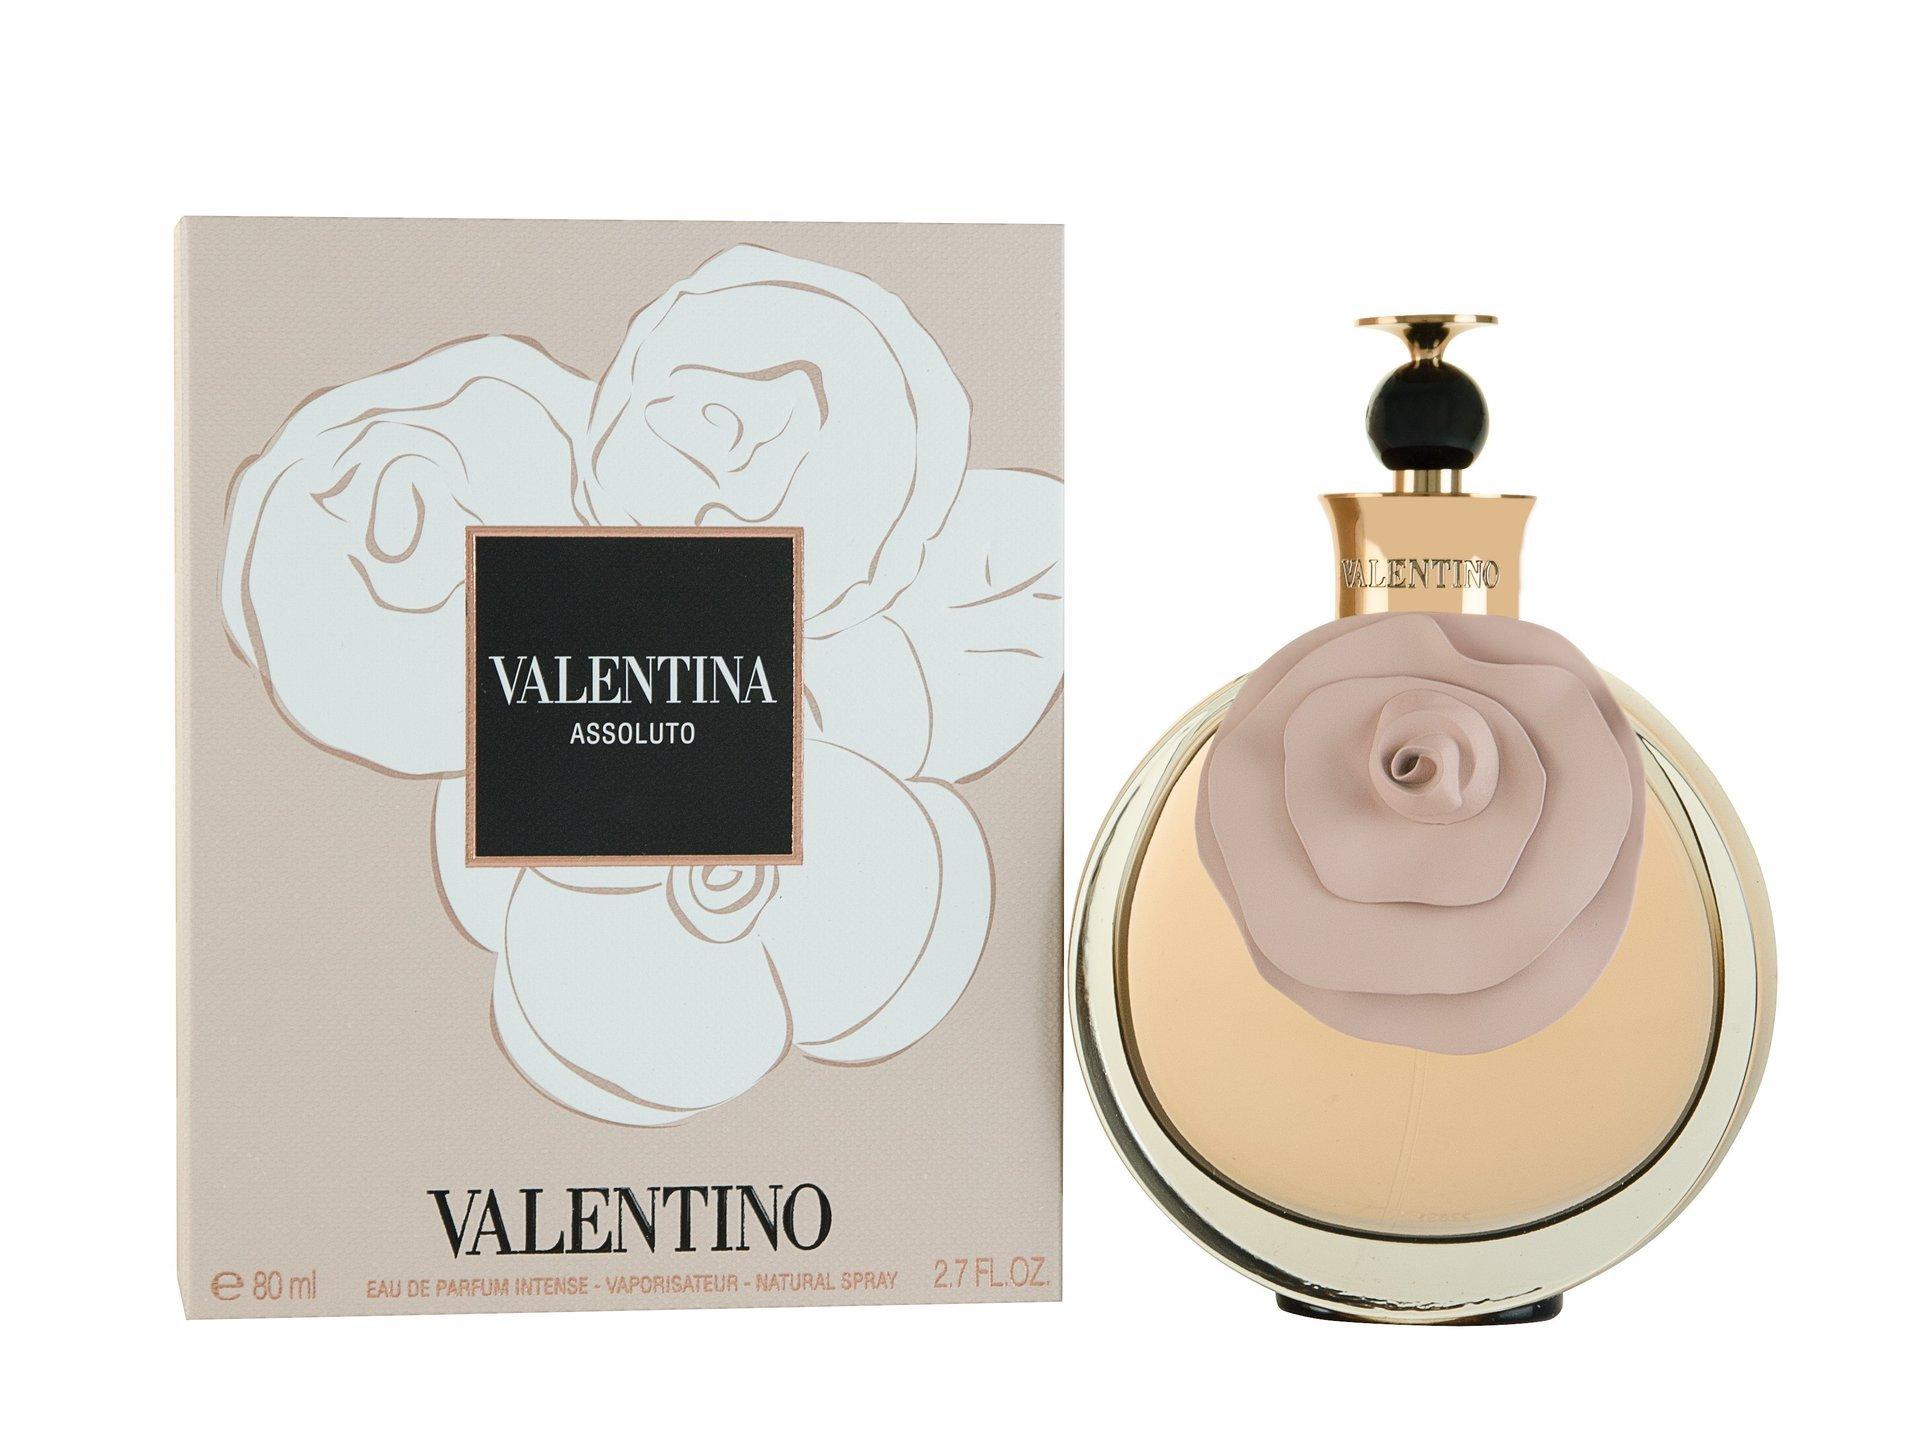 Valentina Assoluto Edp 80ml